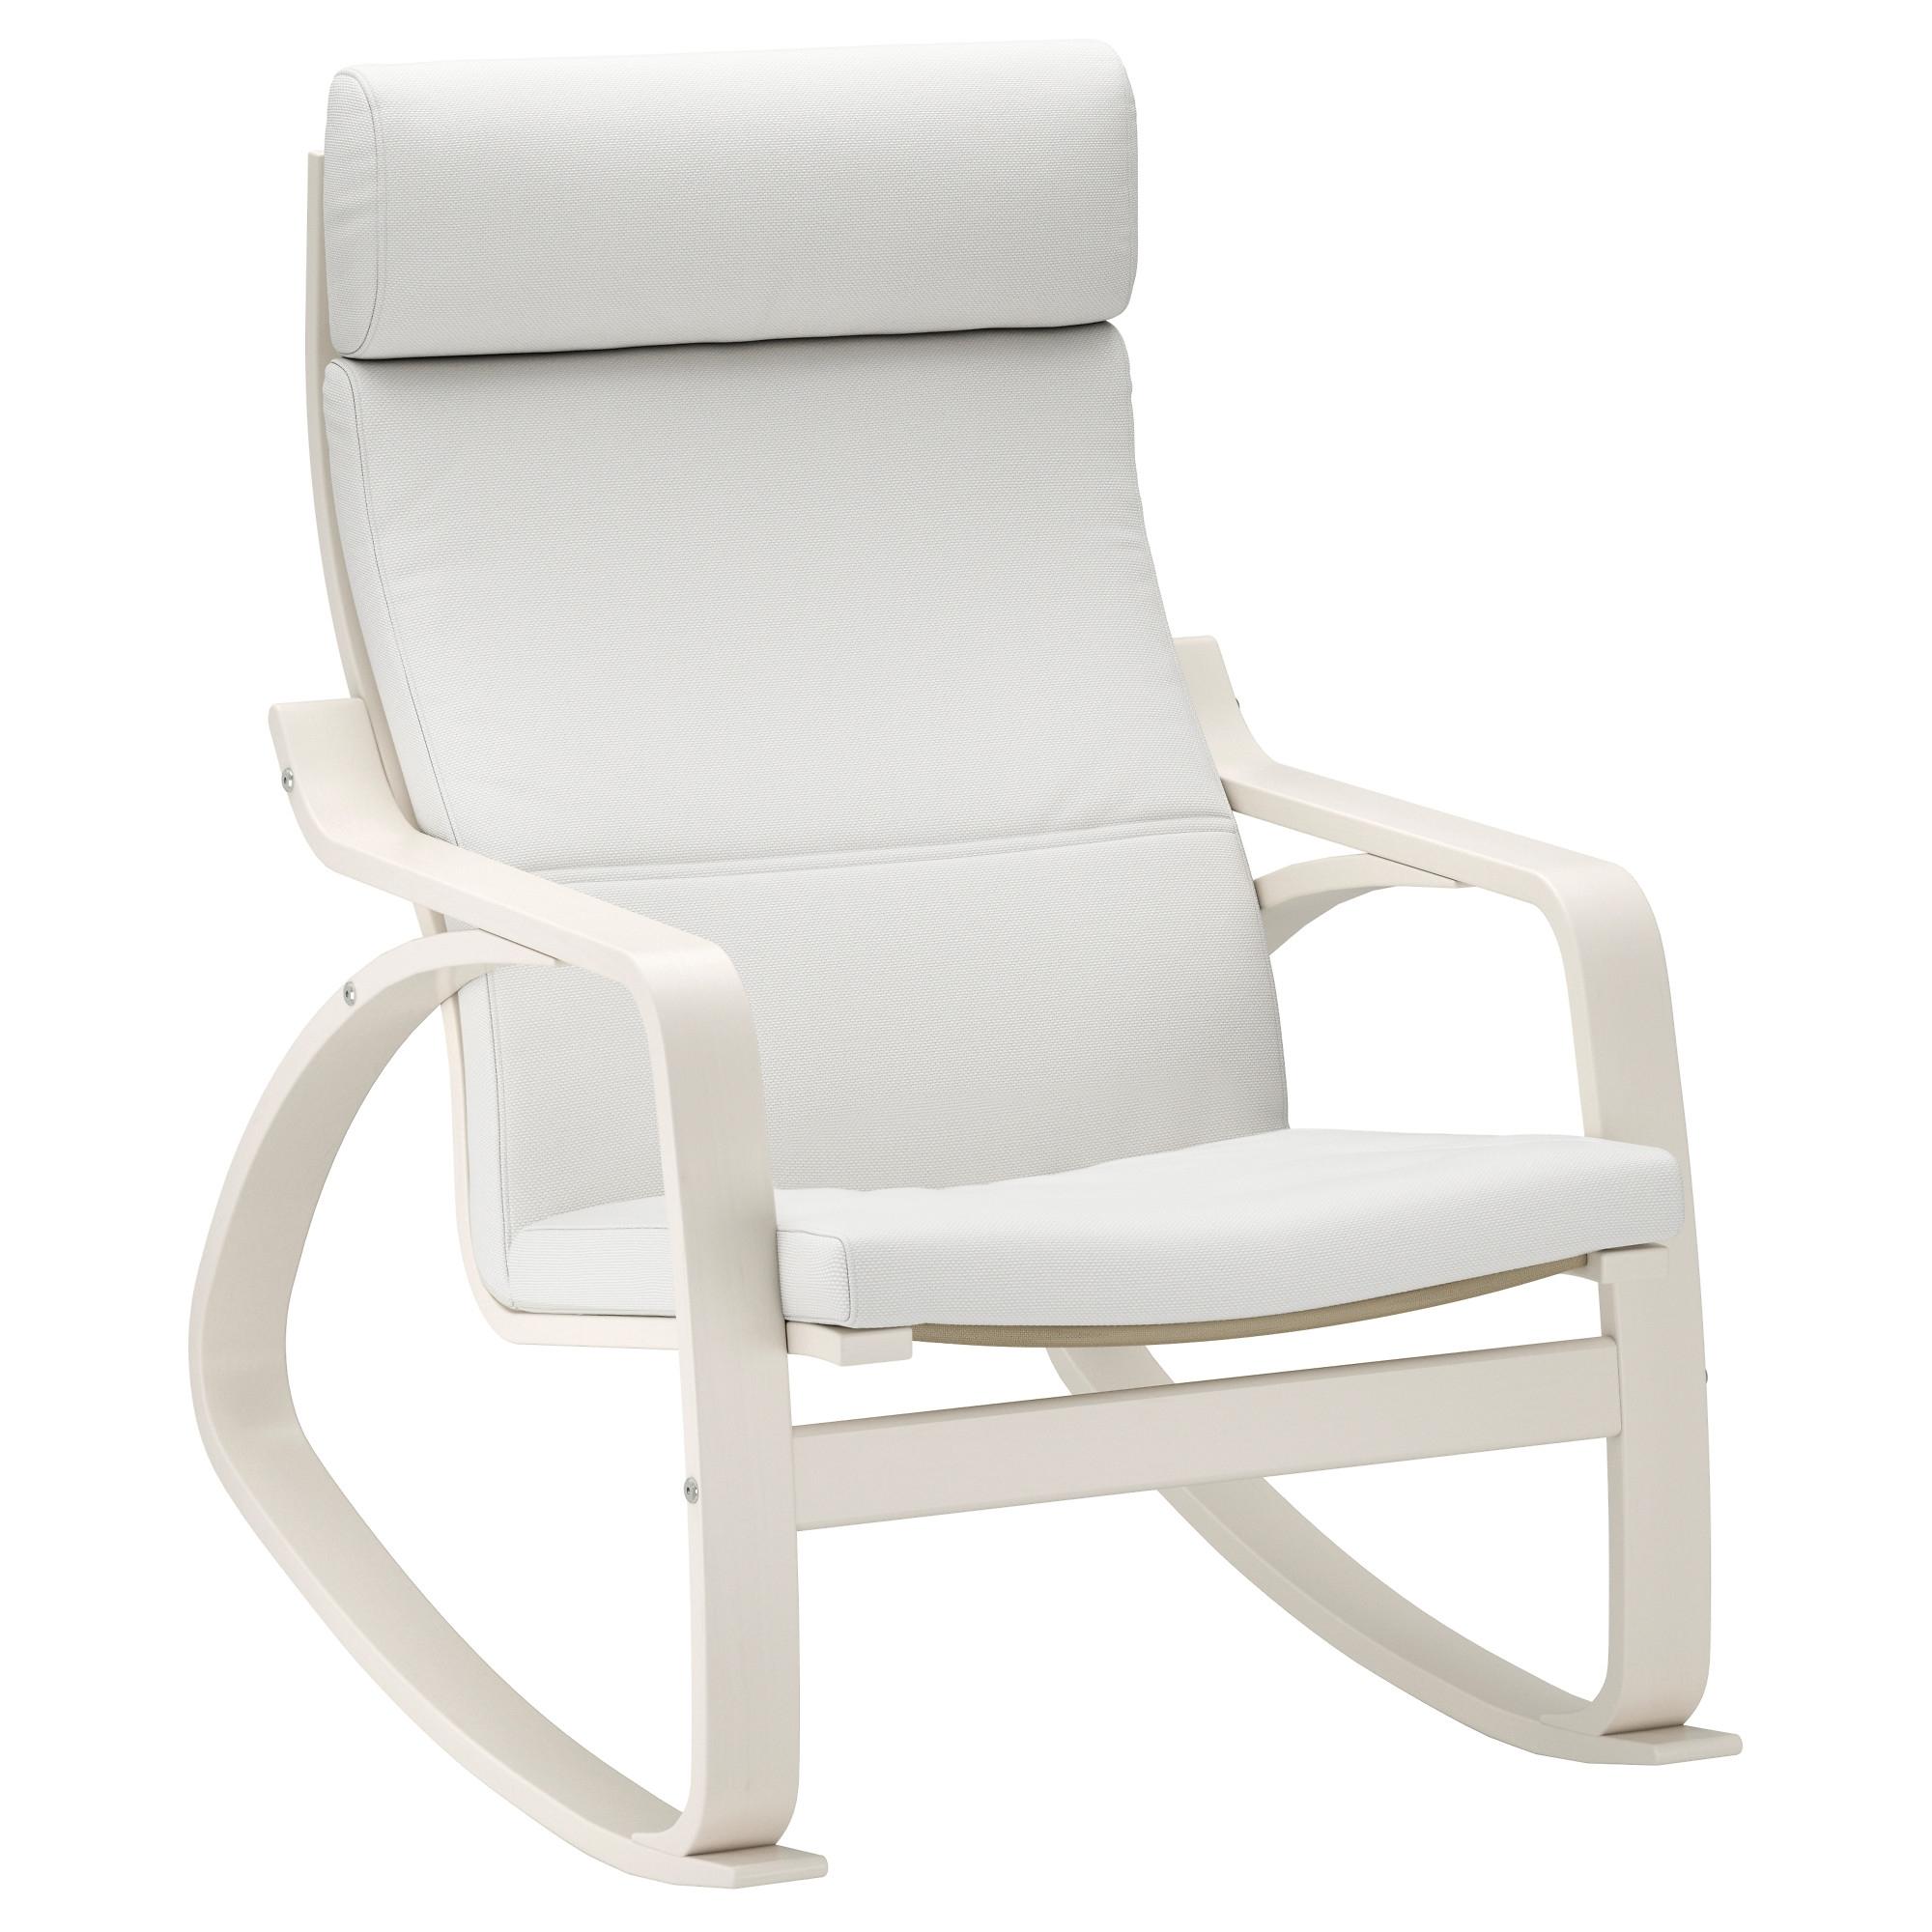 Rocking Chair Parts Modern Glider Rocker White Rocking Chair With Most Up To Date Rocking Chairs At Ikea (View 12 of 15)